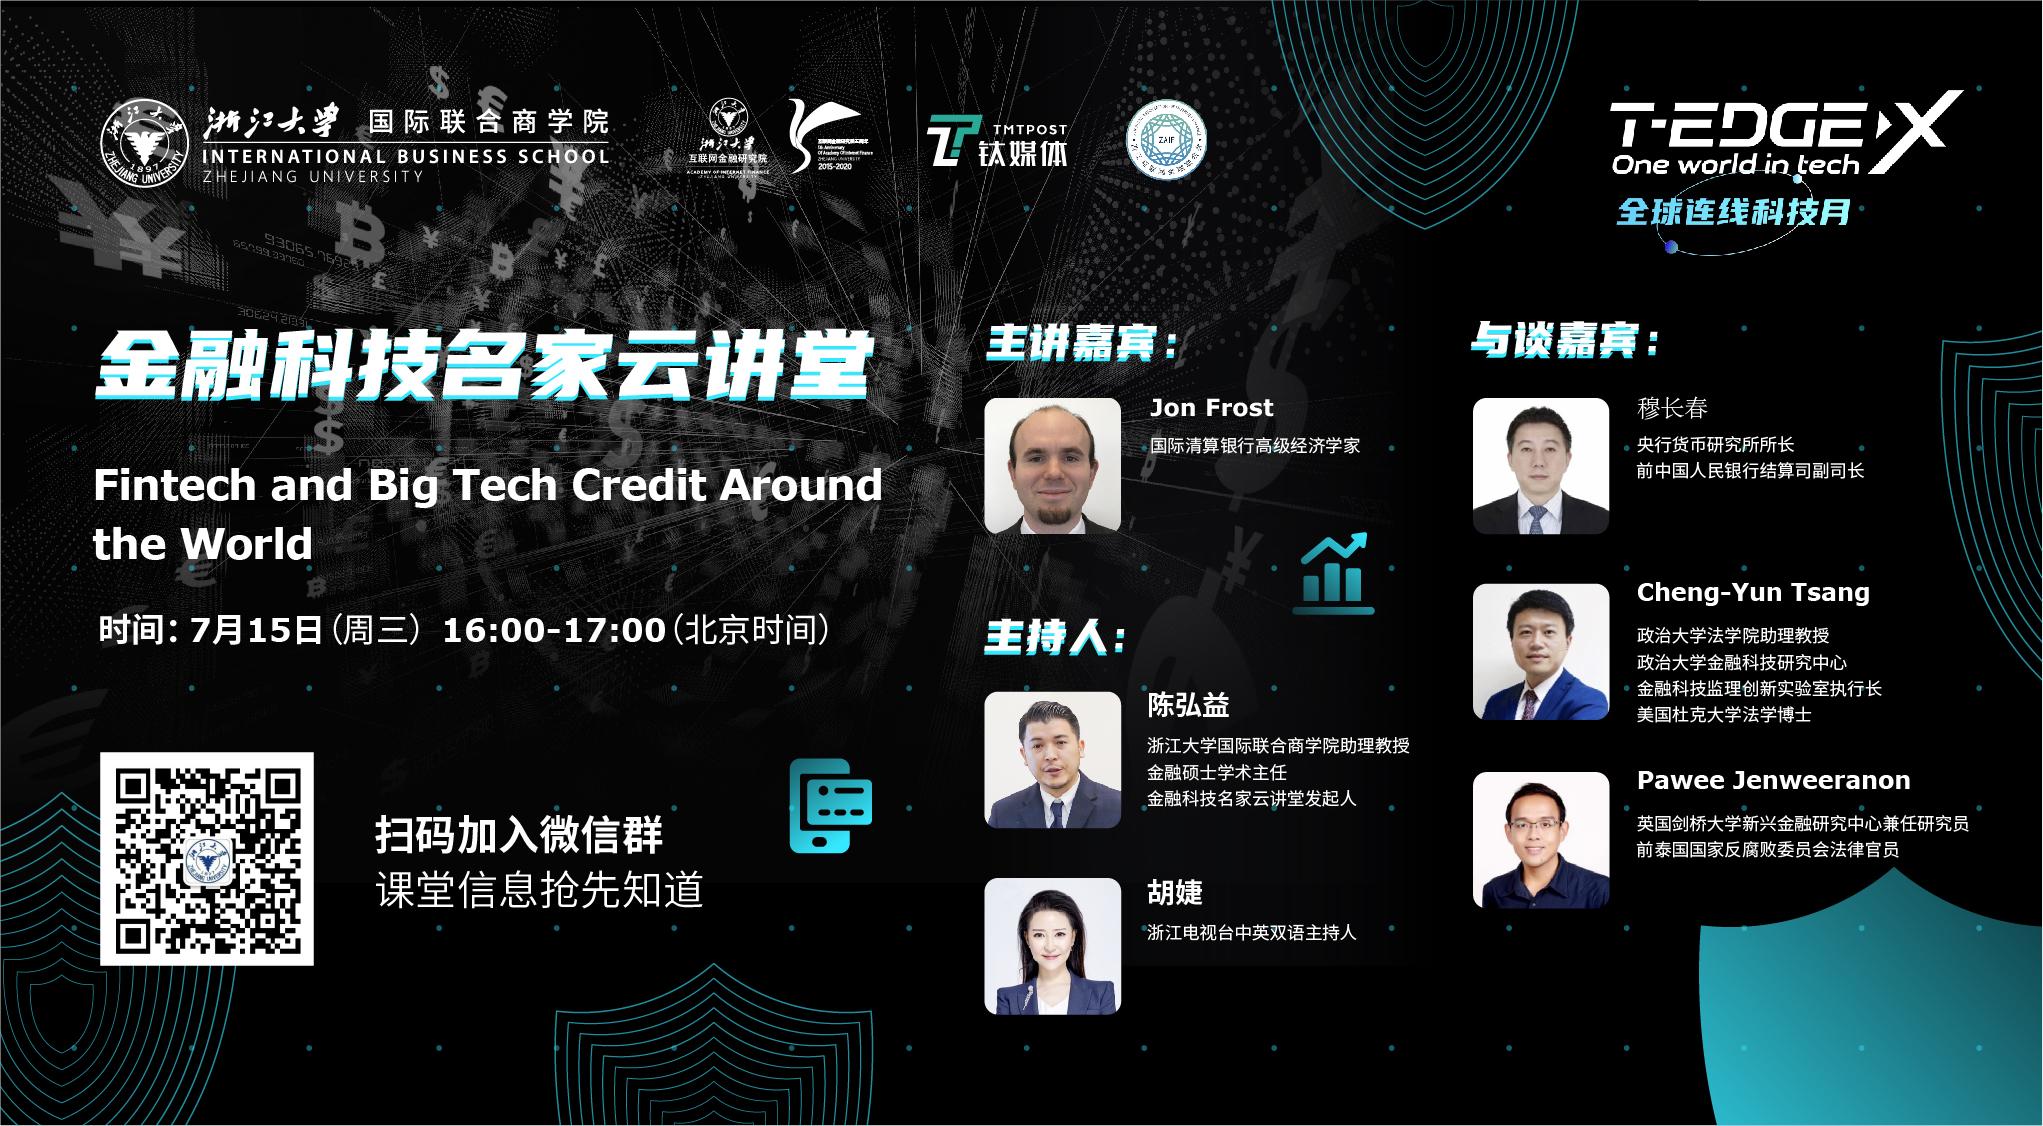 金融科技系列论坛:【名家云讲堂】Fintech and Big Tech Credit Around the World